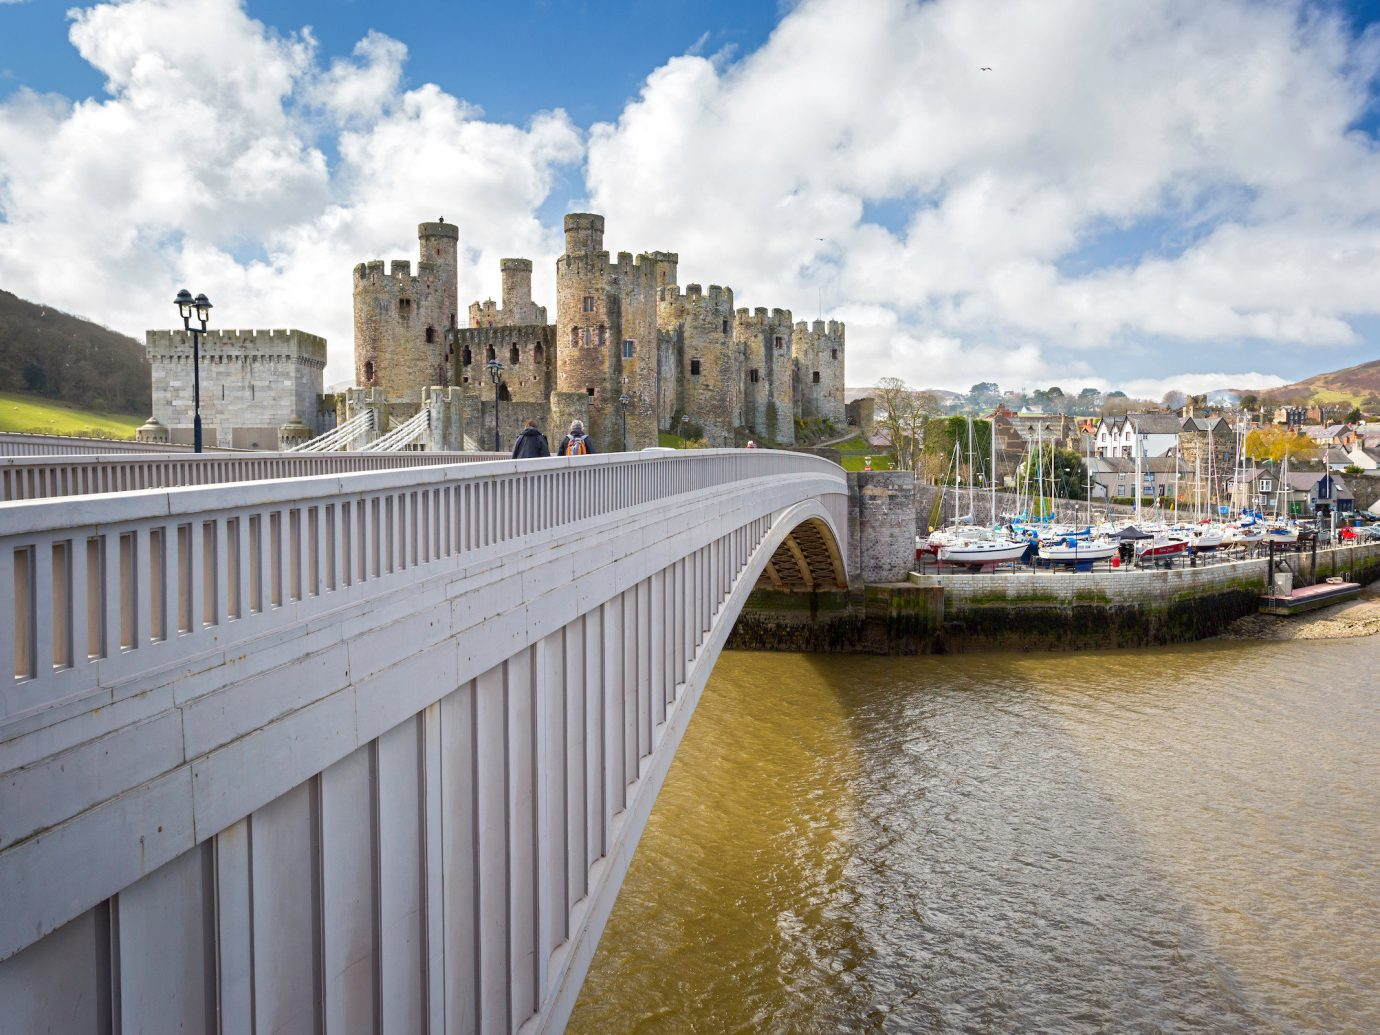 Trip Ideas sky outdoor water River landmark waterway vacation tourism cityscape bridge Canal Sea Coast day